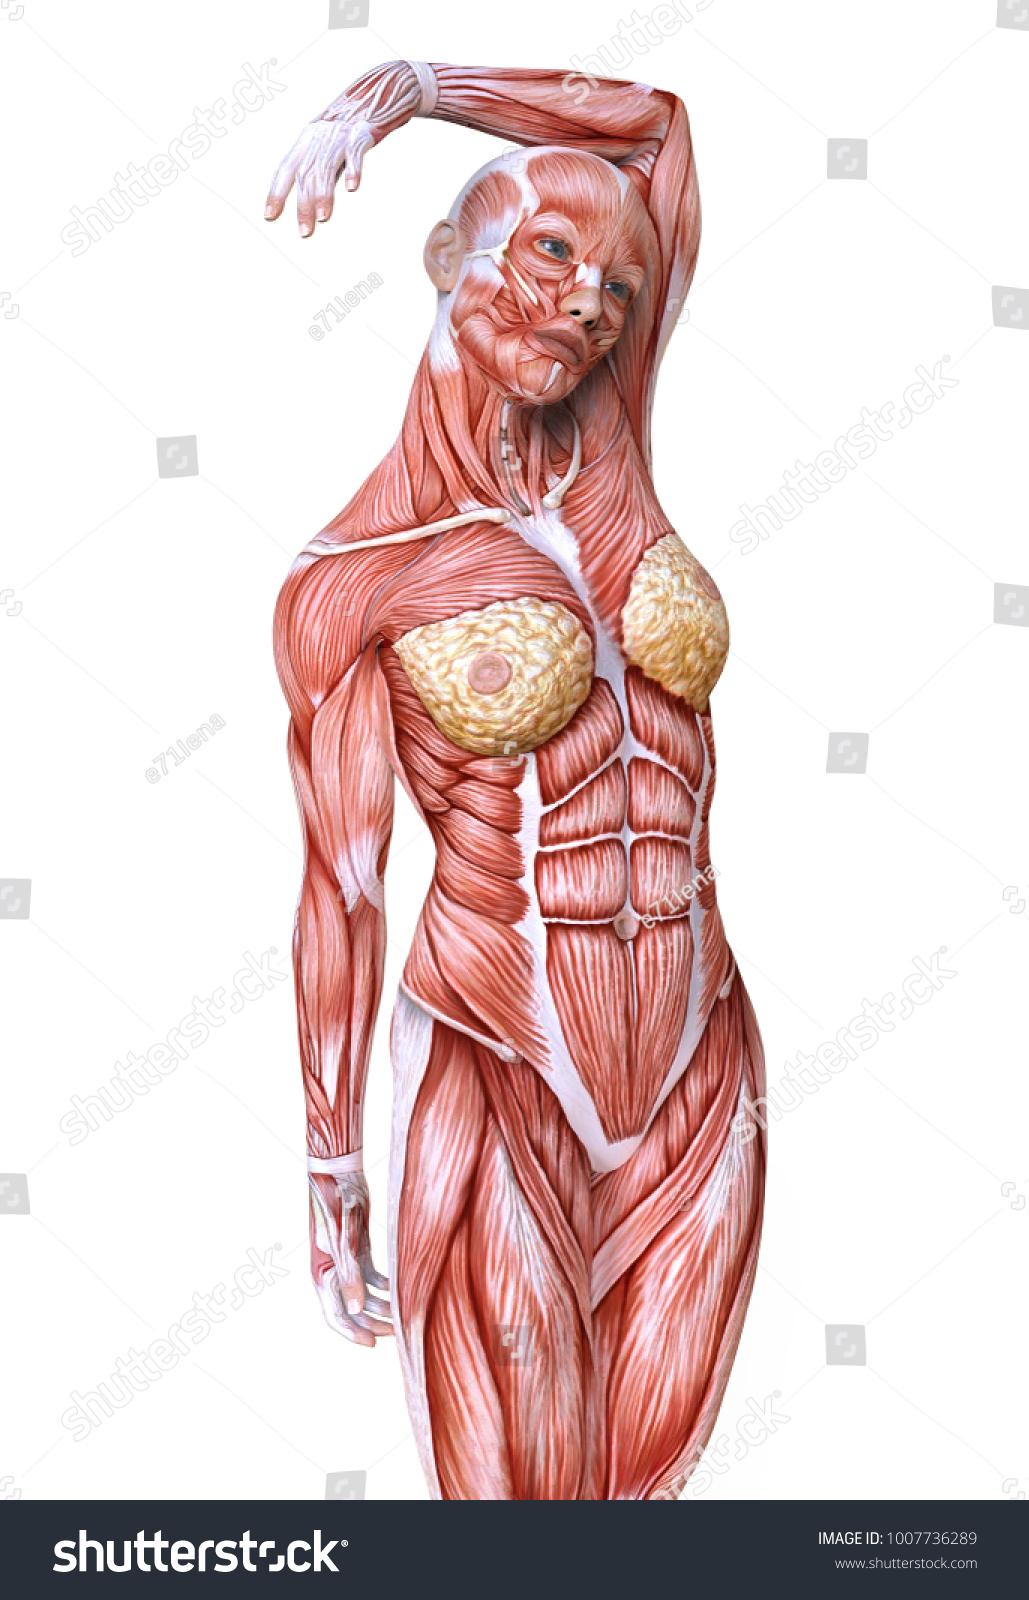 Royalty Free Stock Illustration Of Female Body Without Skin Anatomy